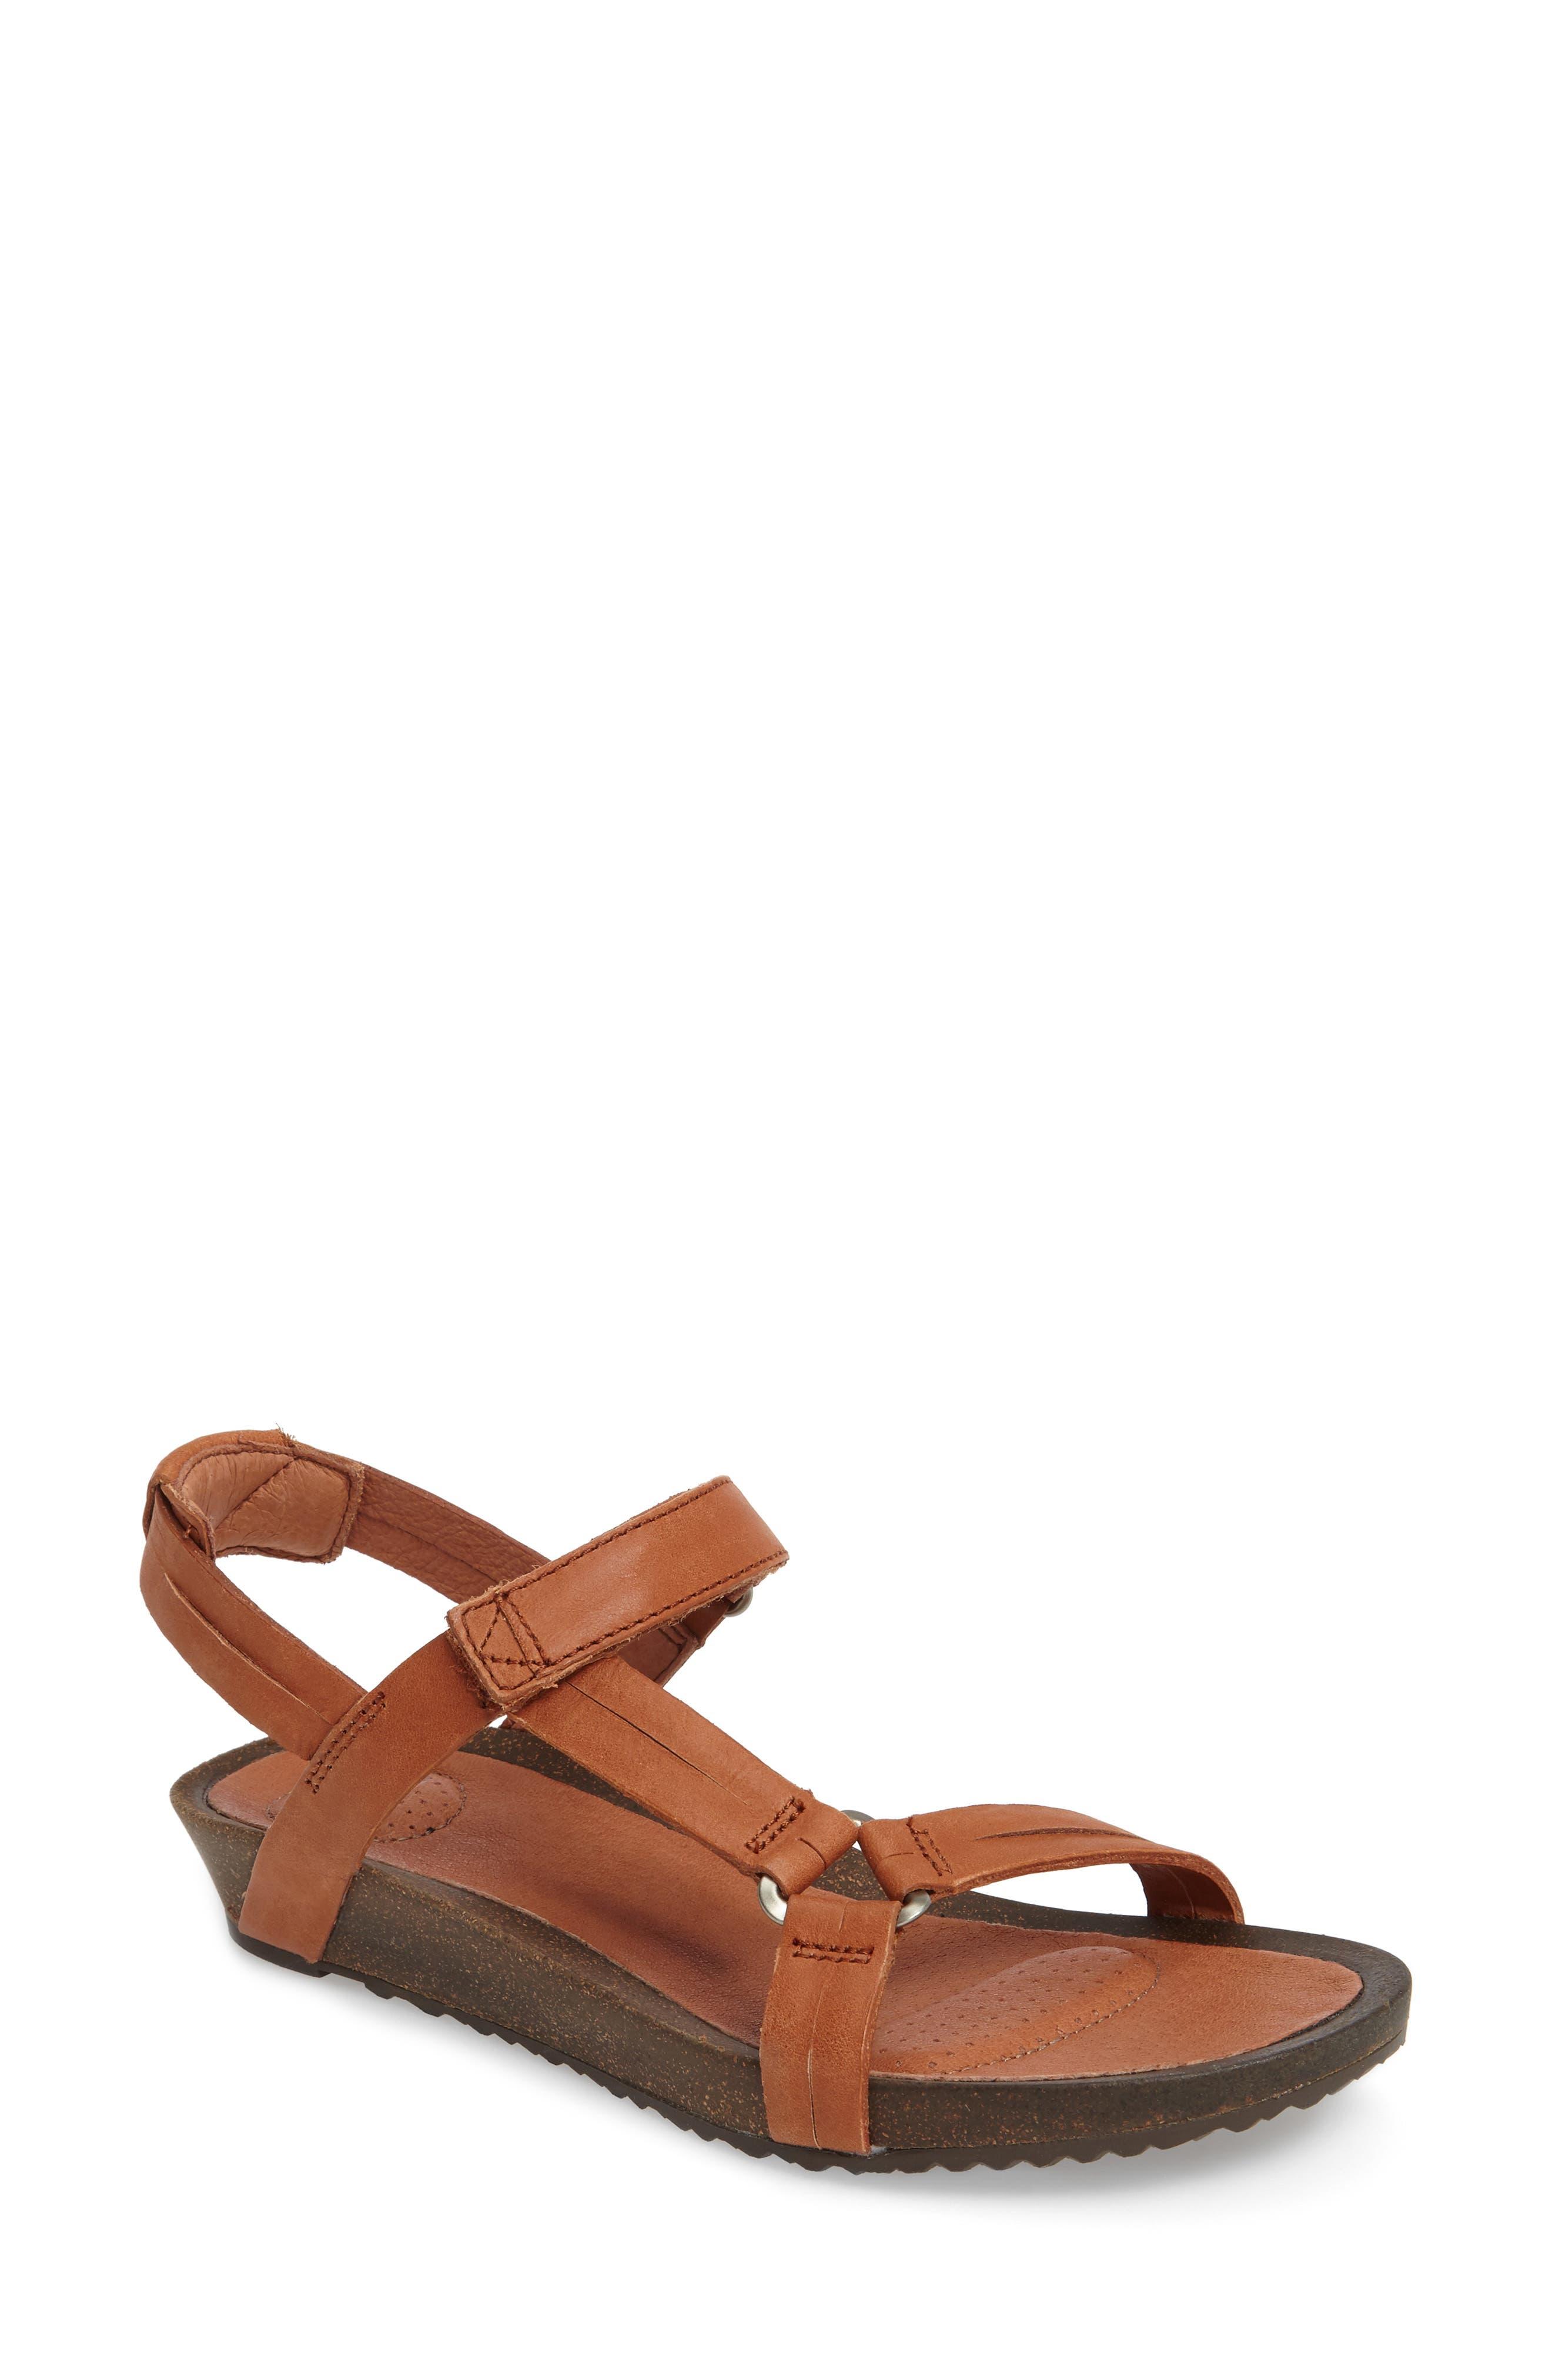 Ysidro Universal Sandal,                         Main,                         color, Cognac Leather